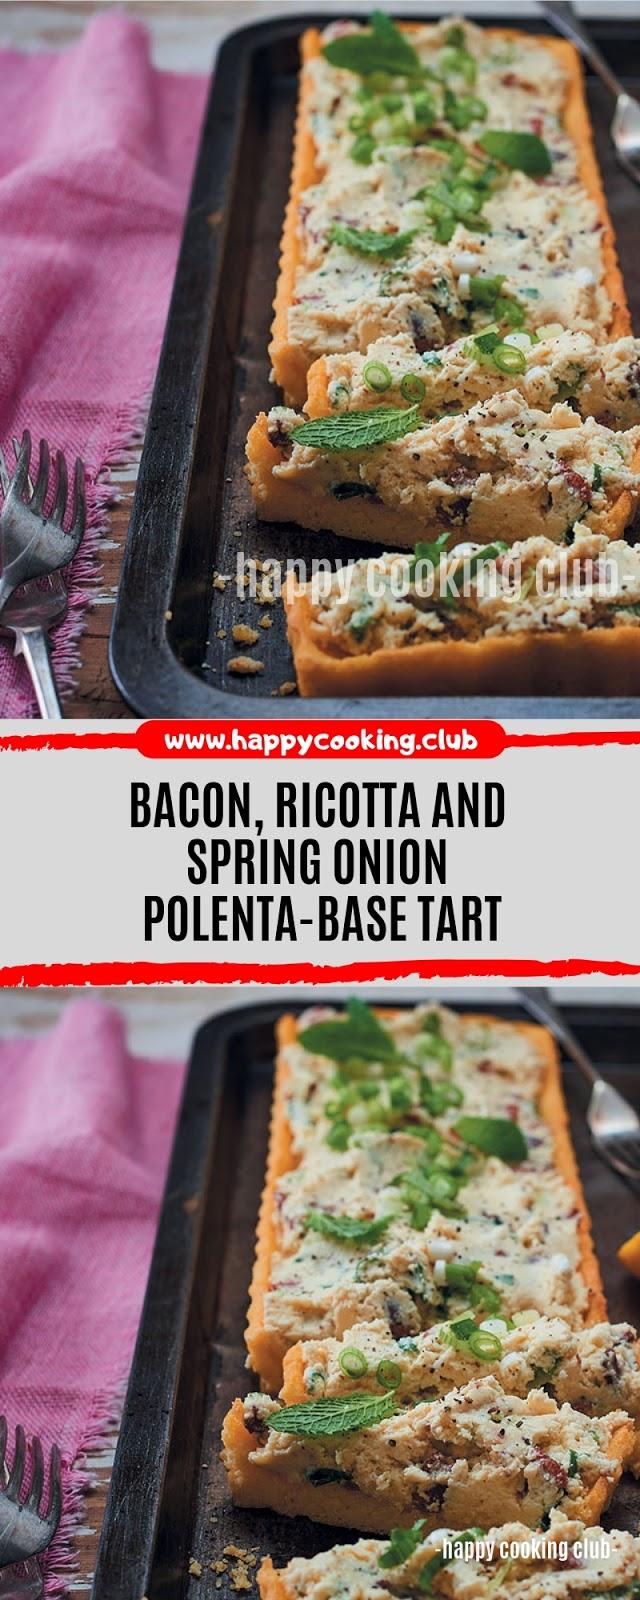 Bacon, ricotta and spring onion polenta-base tart